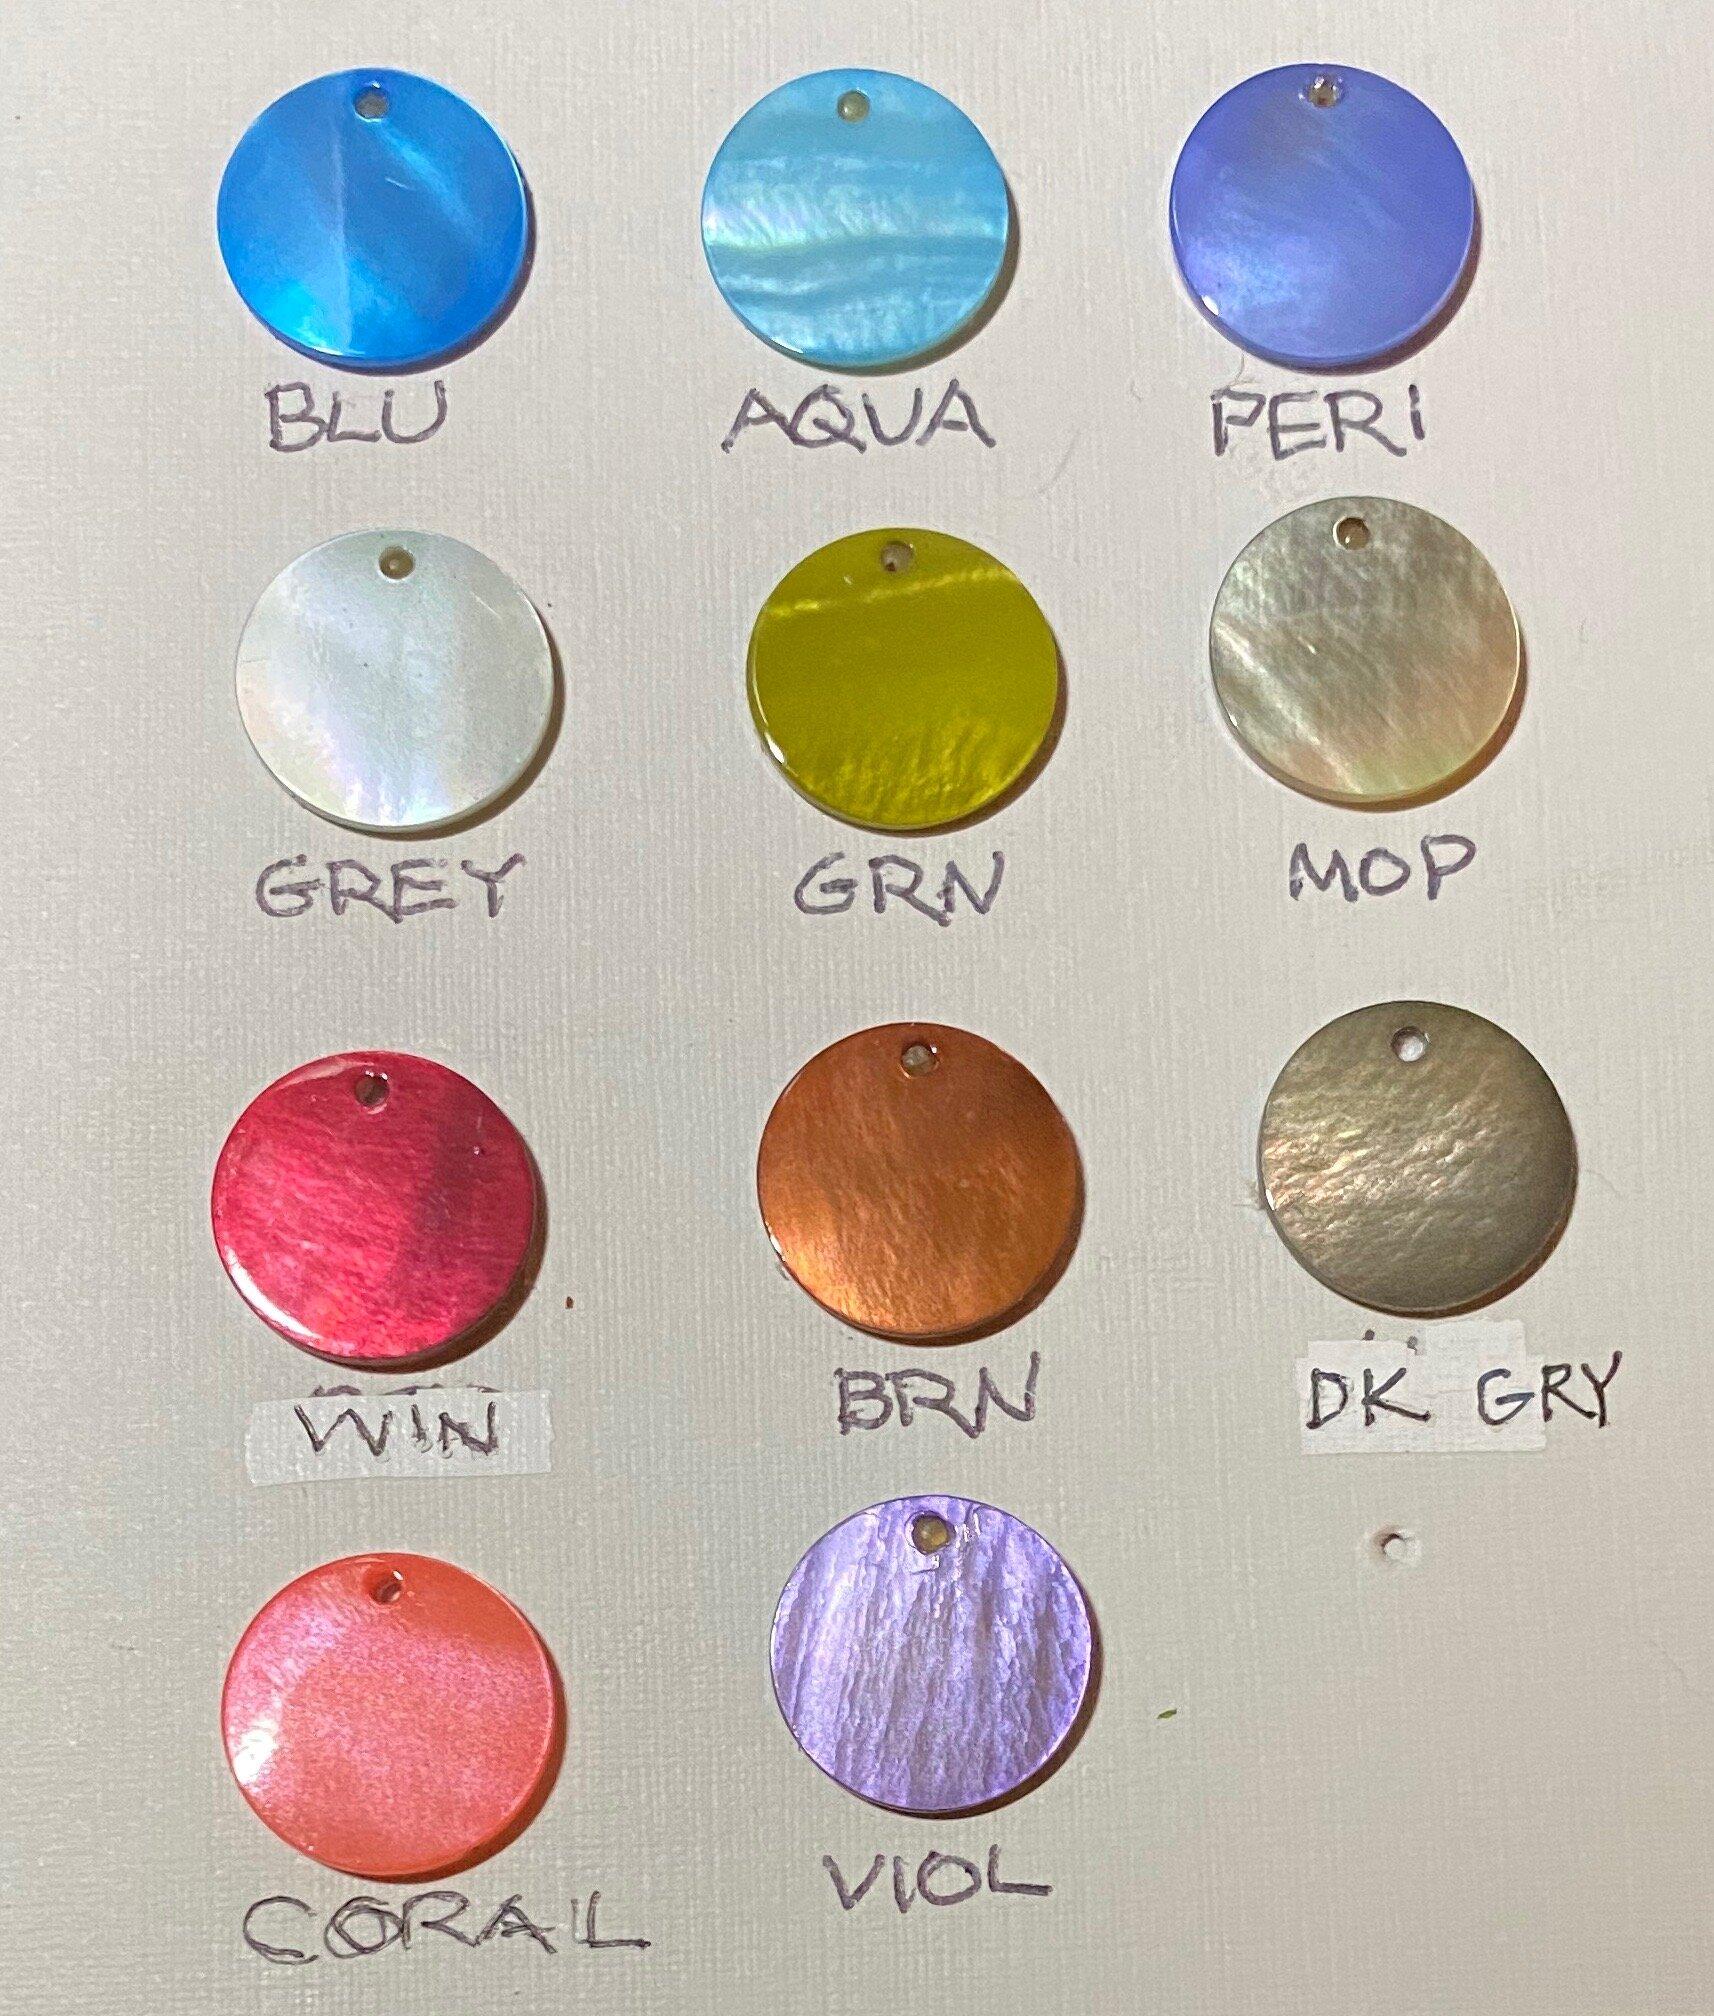 jmr-shell-colors.jpg